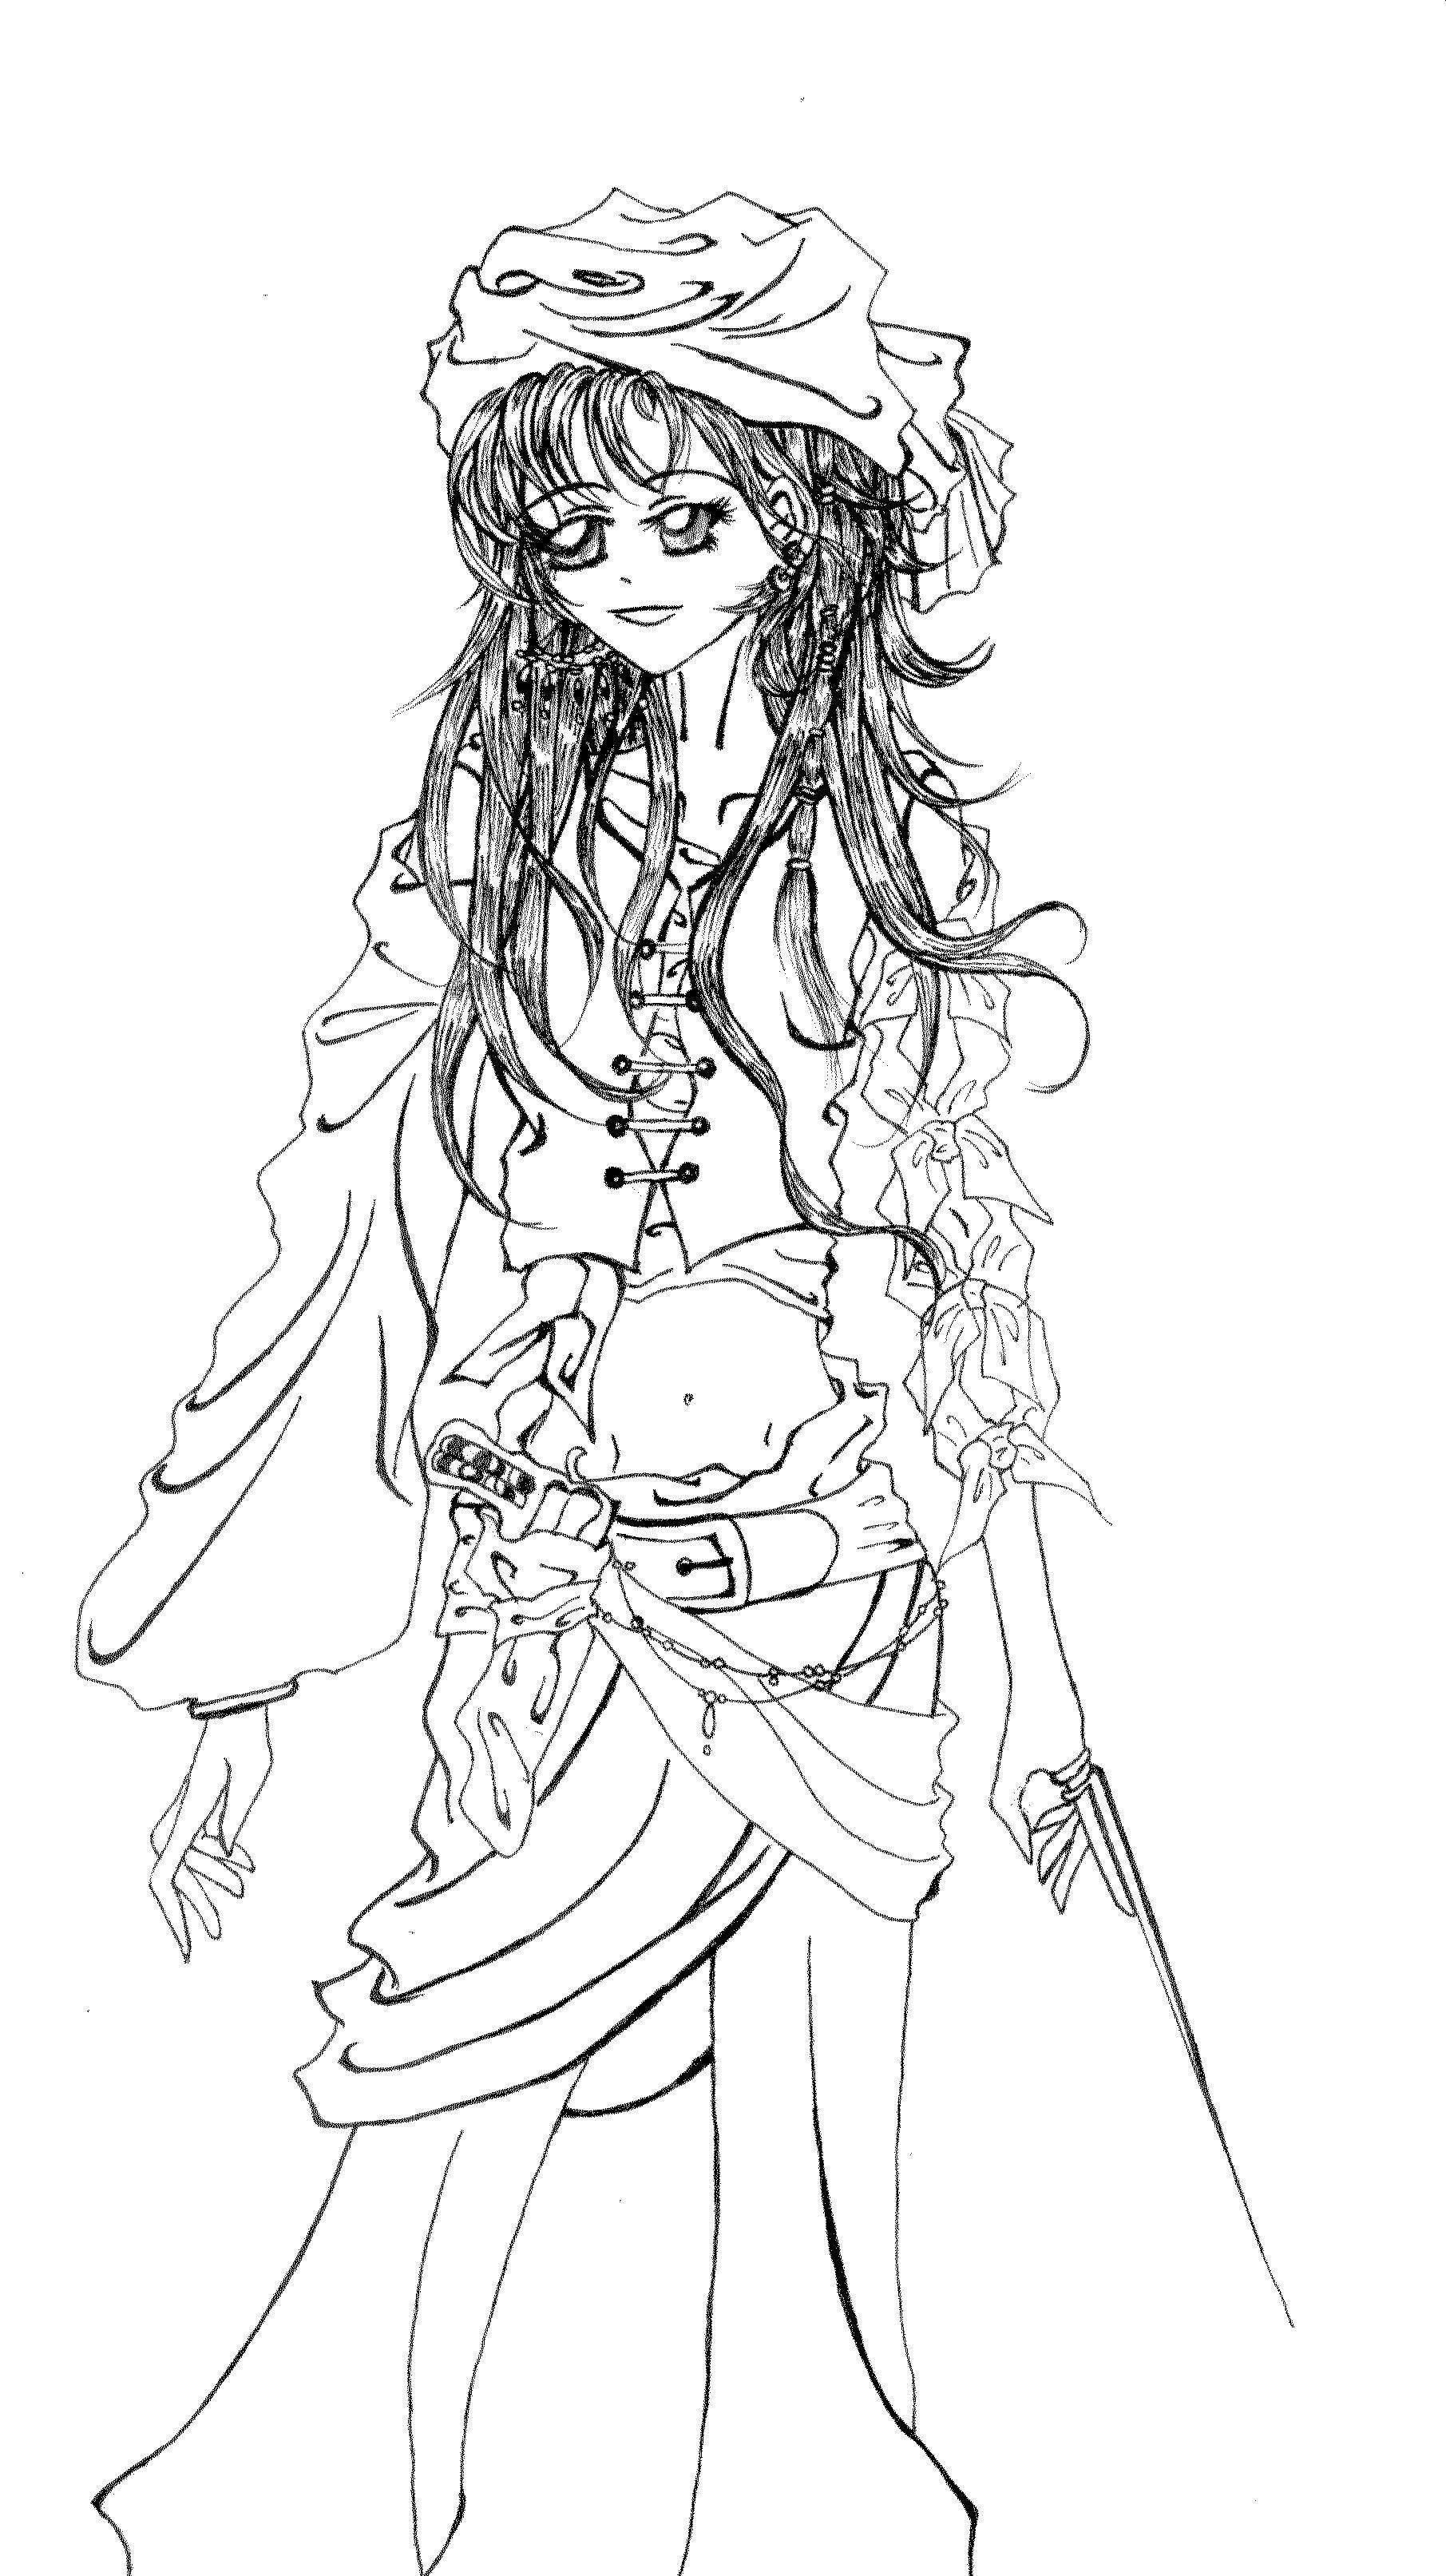 Female pirate drawing - photo#19